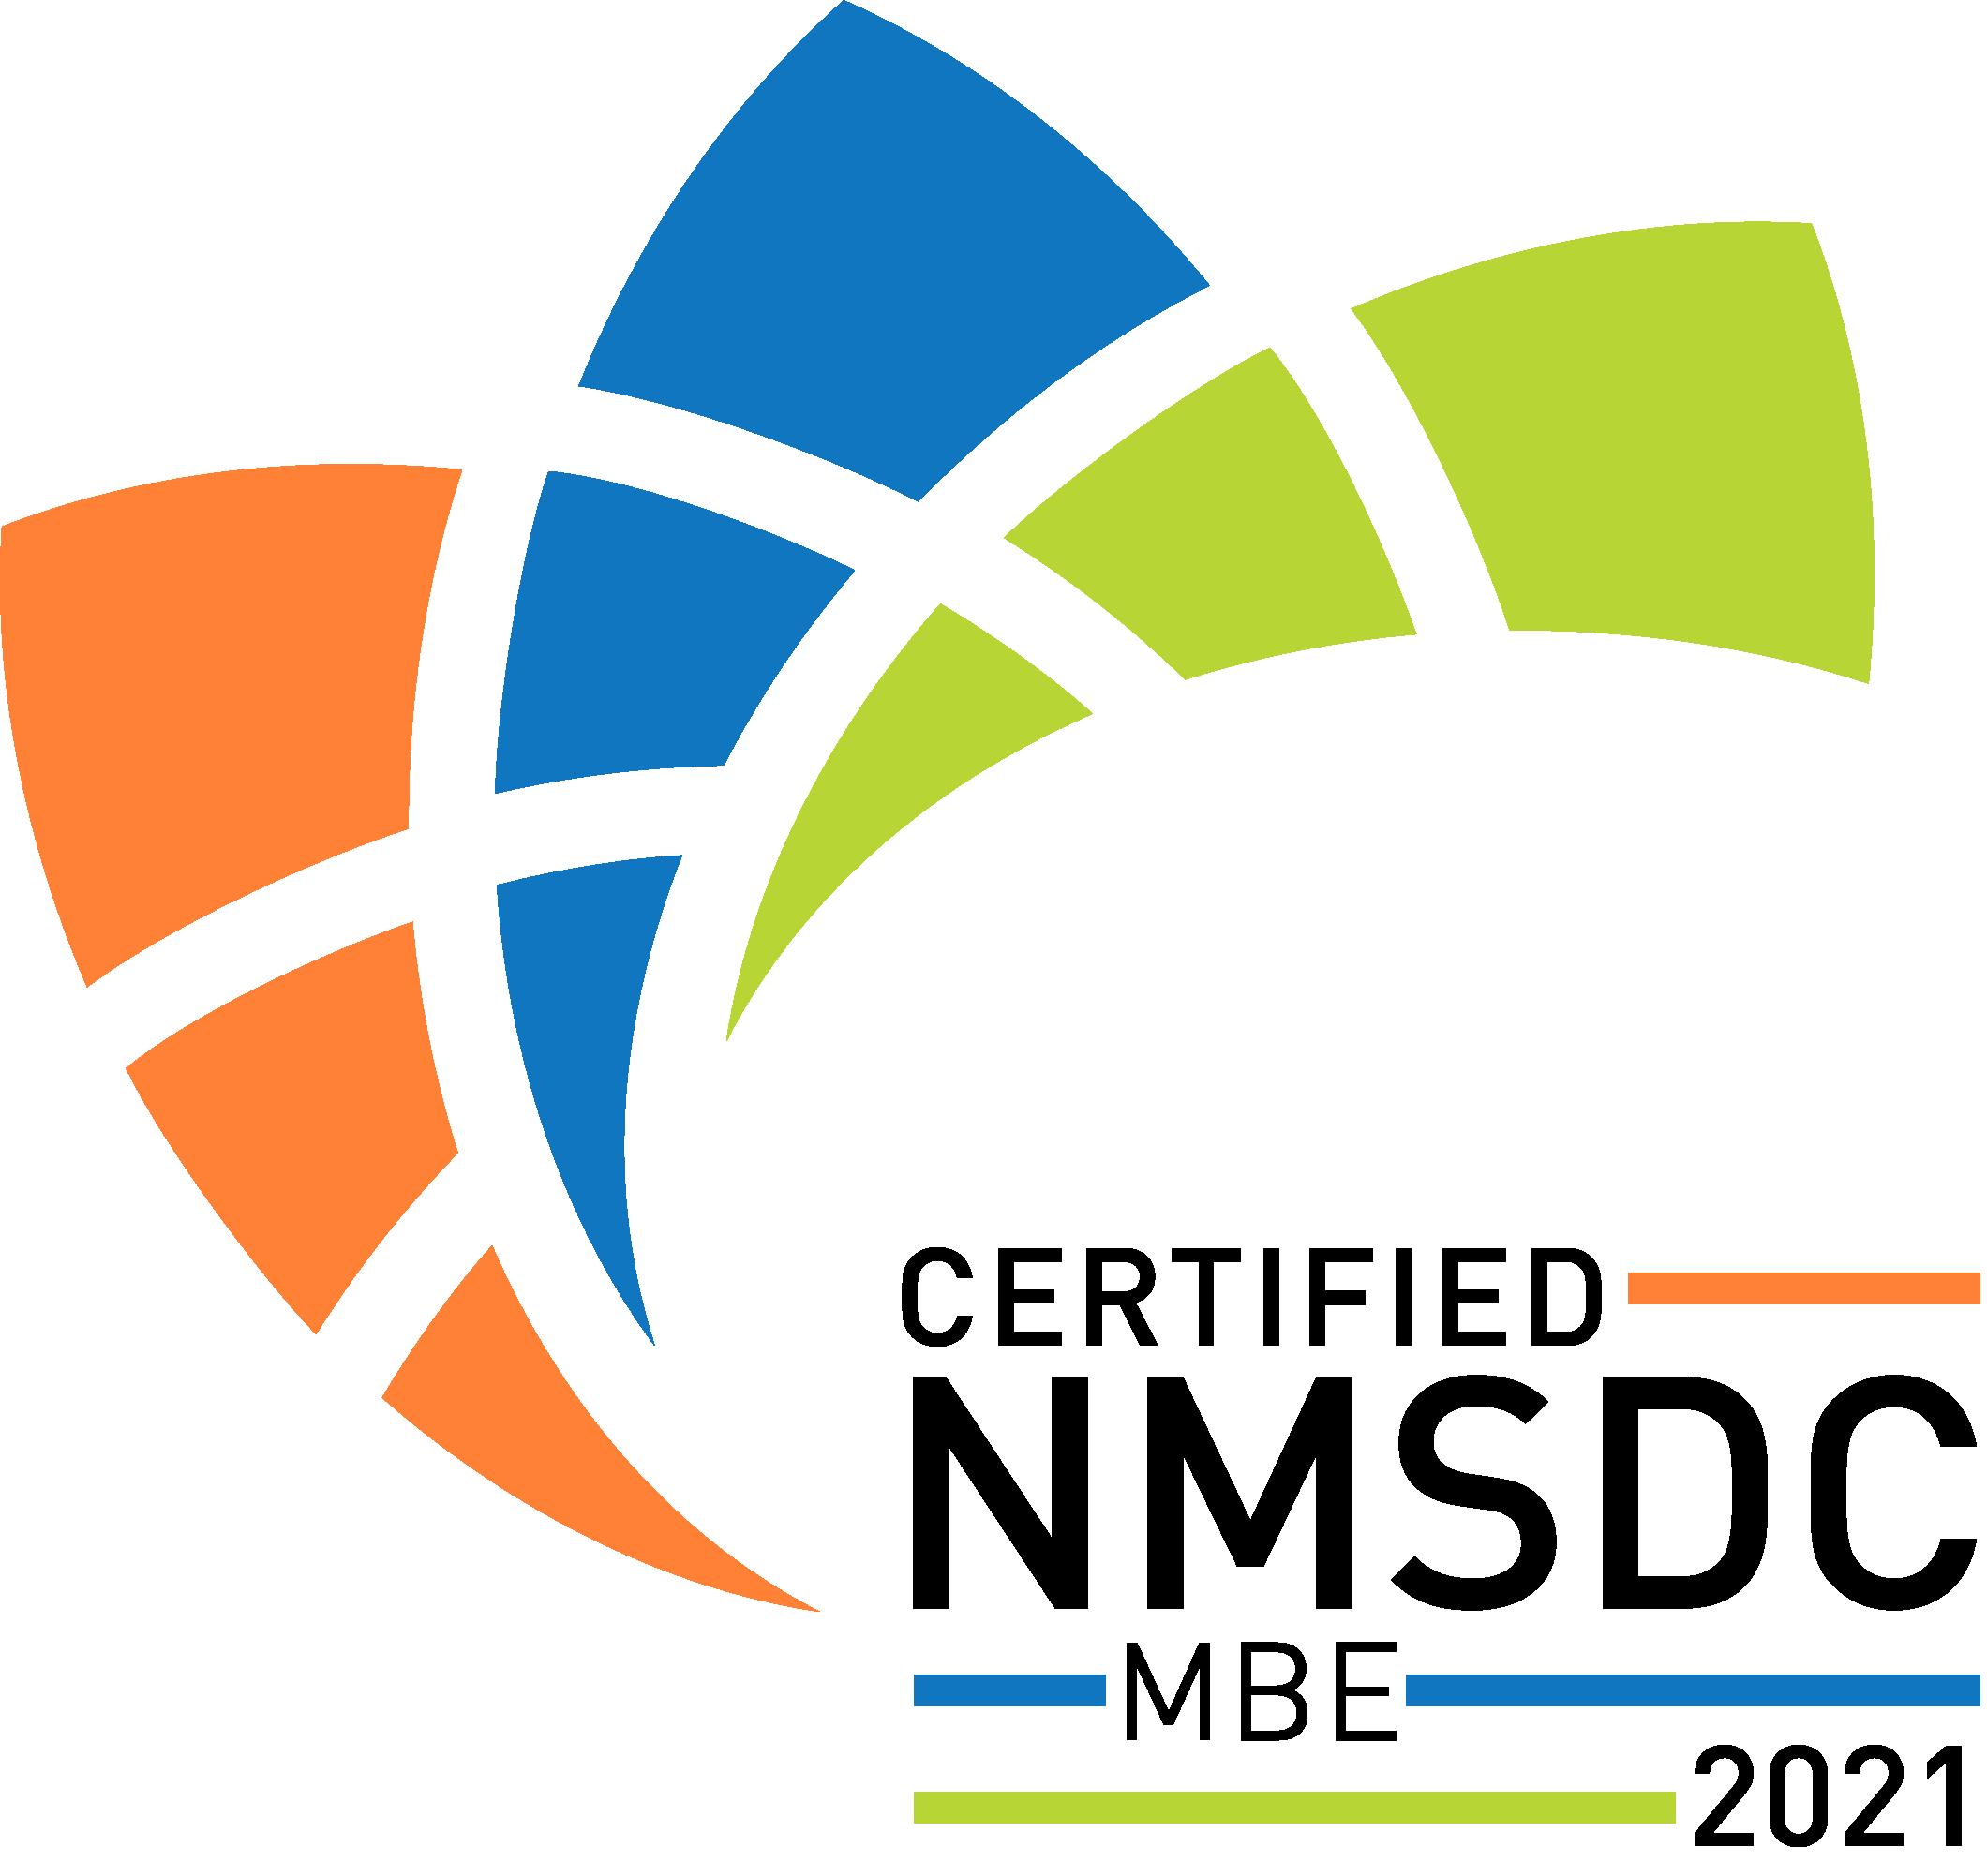 nmsdc certification logo